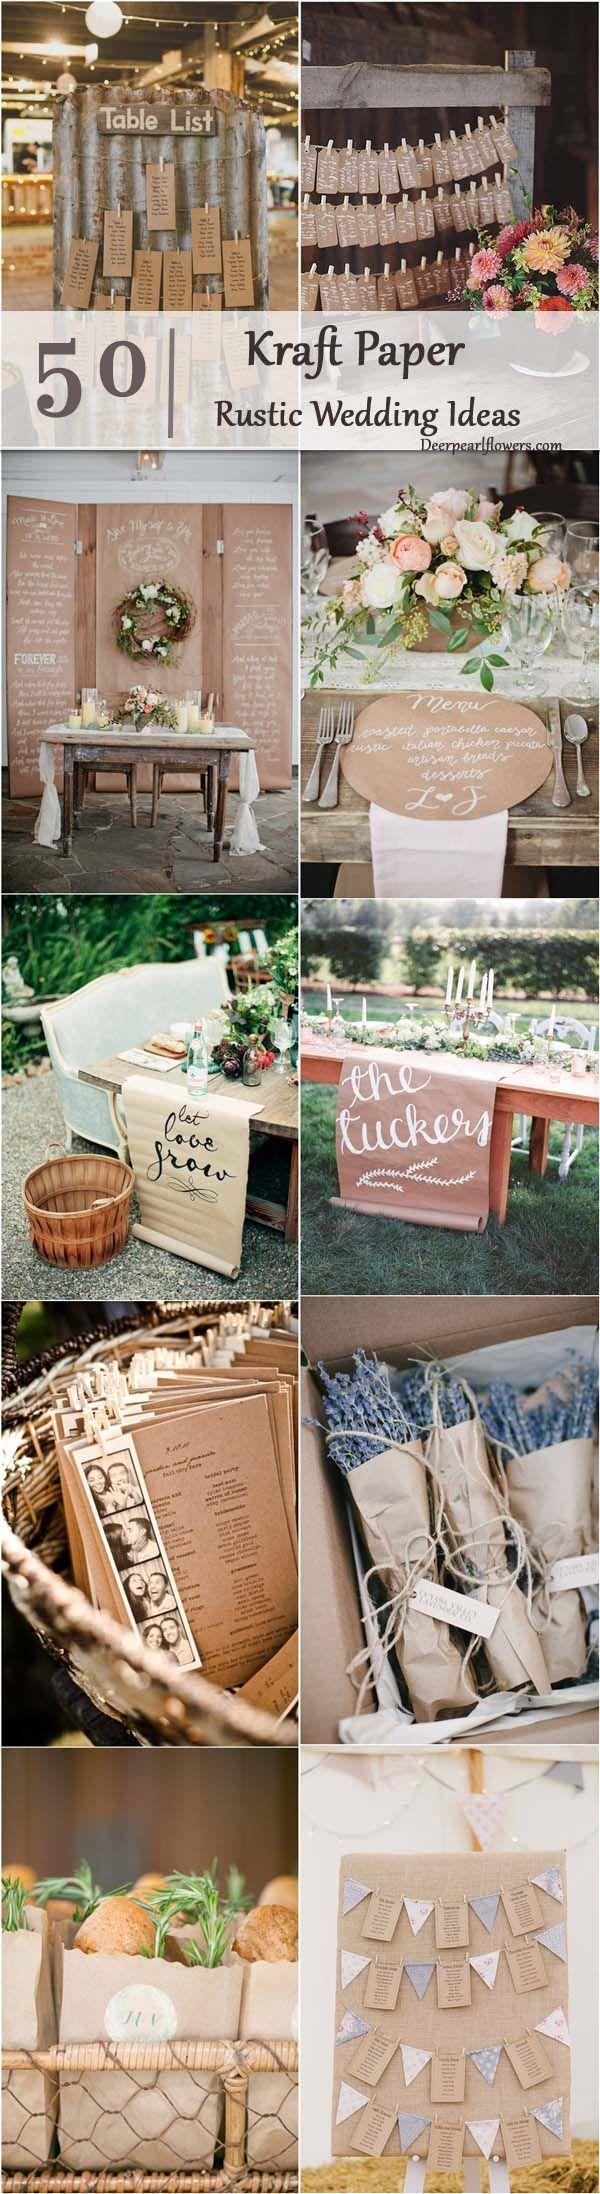 rustic country wedding ideas- kraft paper wedding theme details / http://www.deerpearlflowers.com/rustic-country-kraft-paper-wedding-ideas/